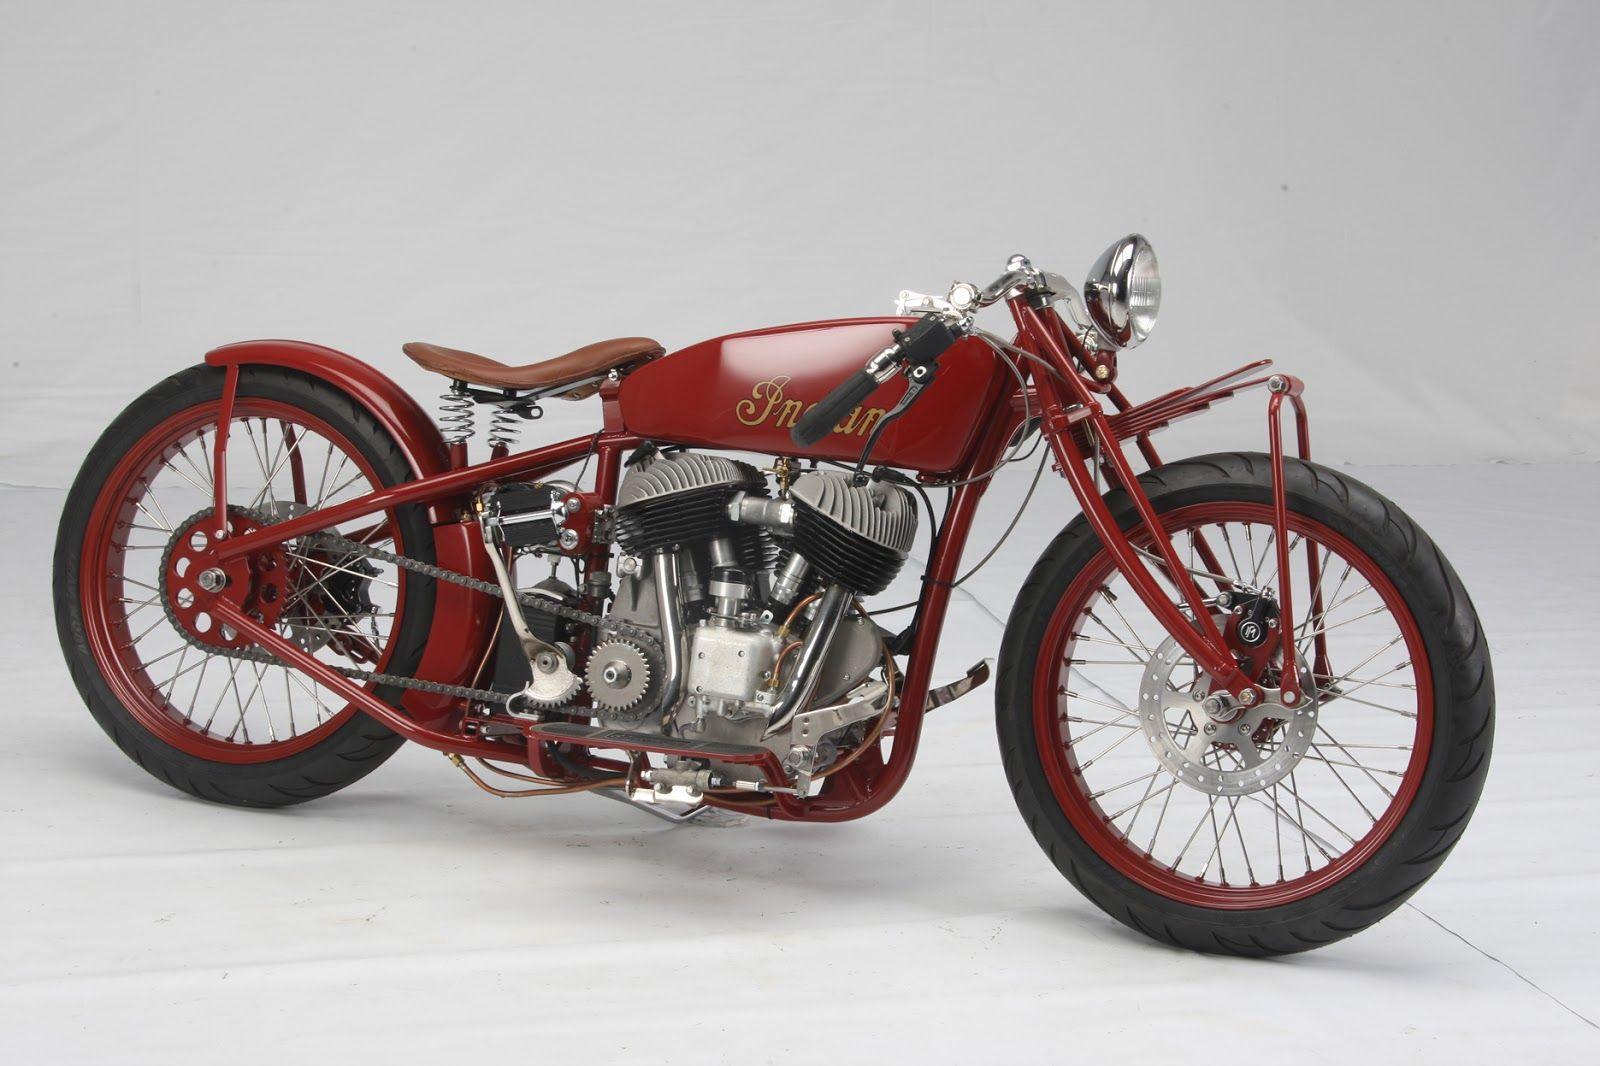 big motorcycles wallpapers - photo #44